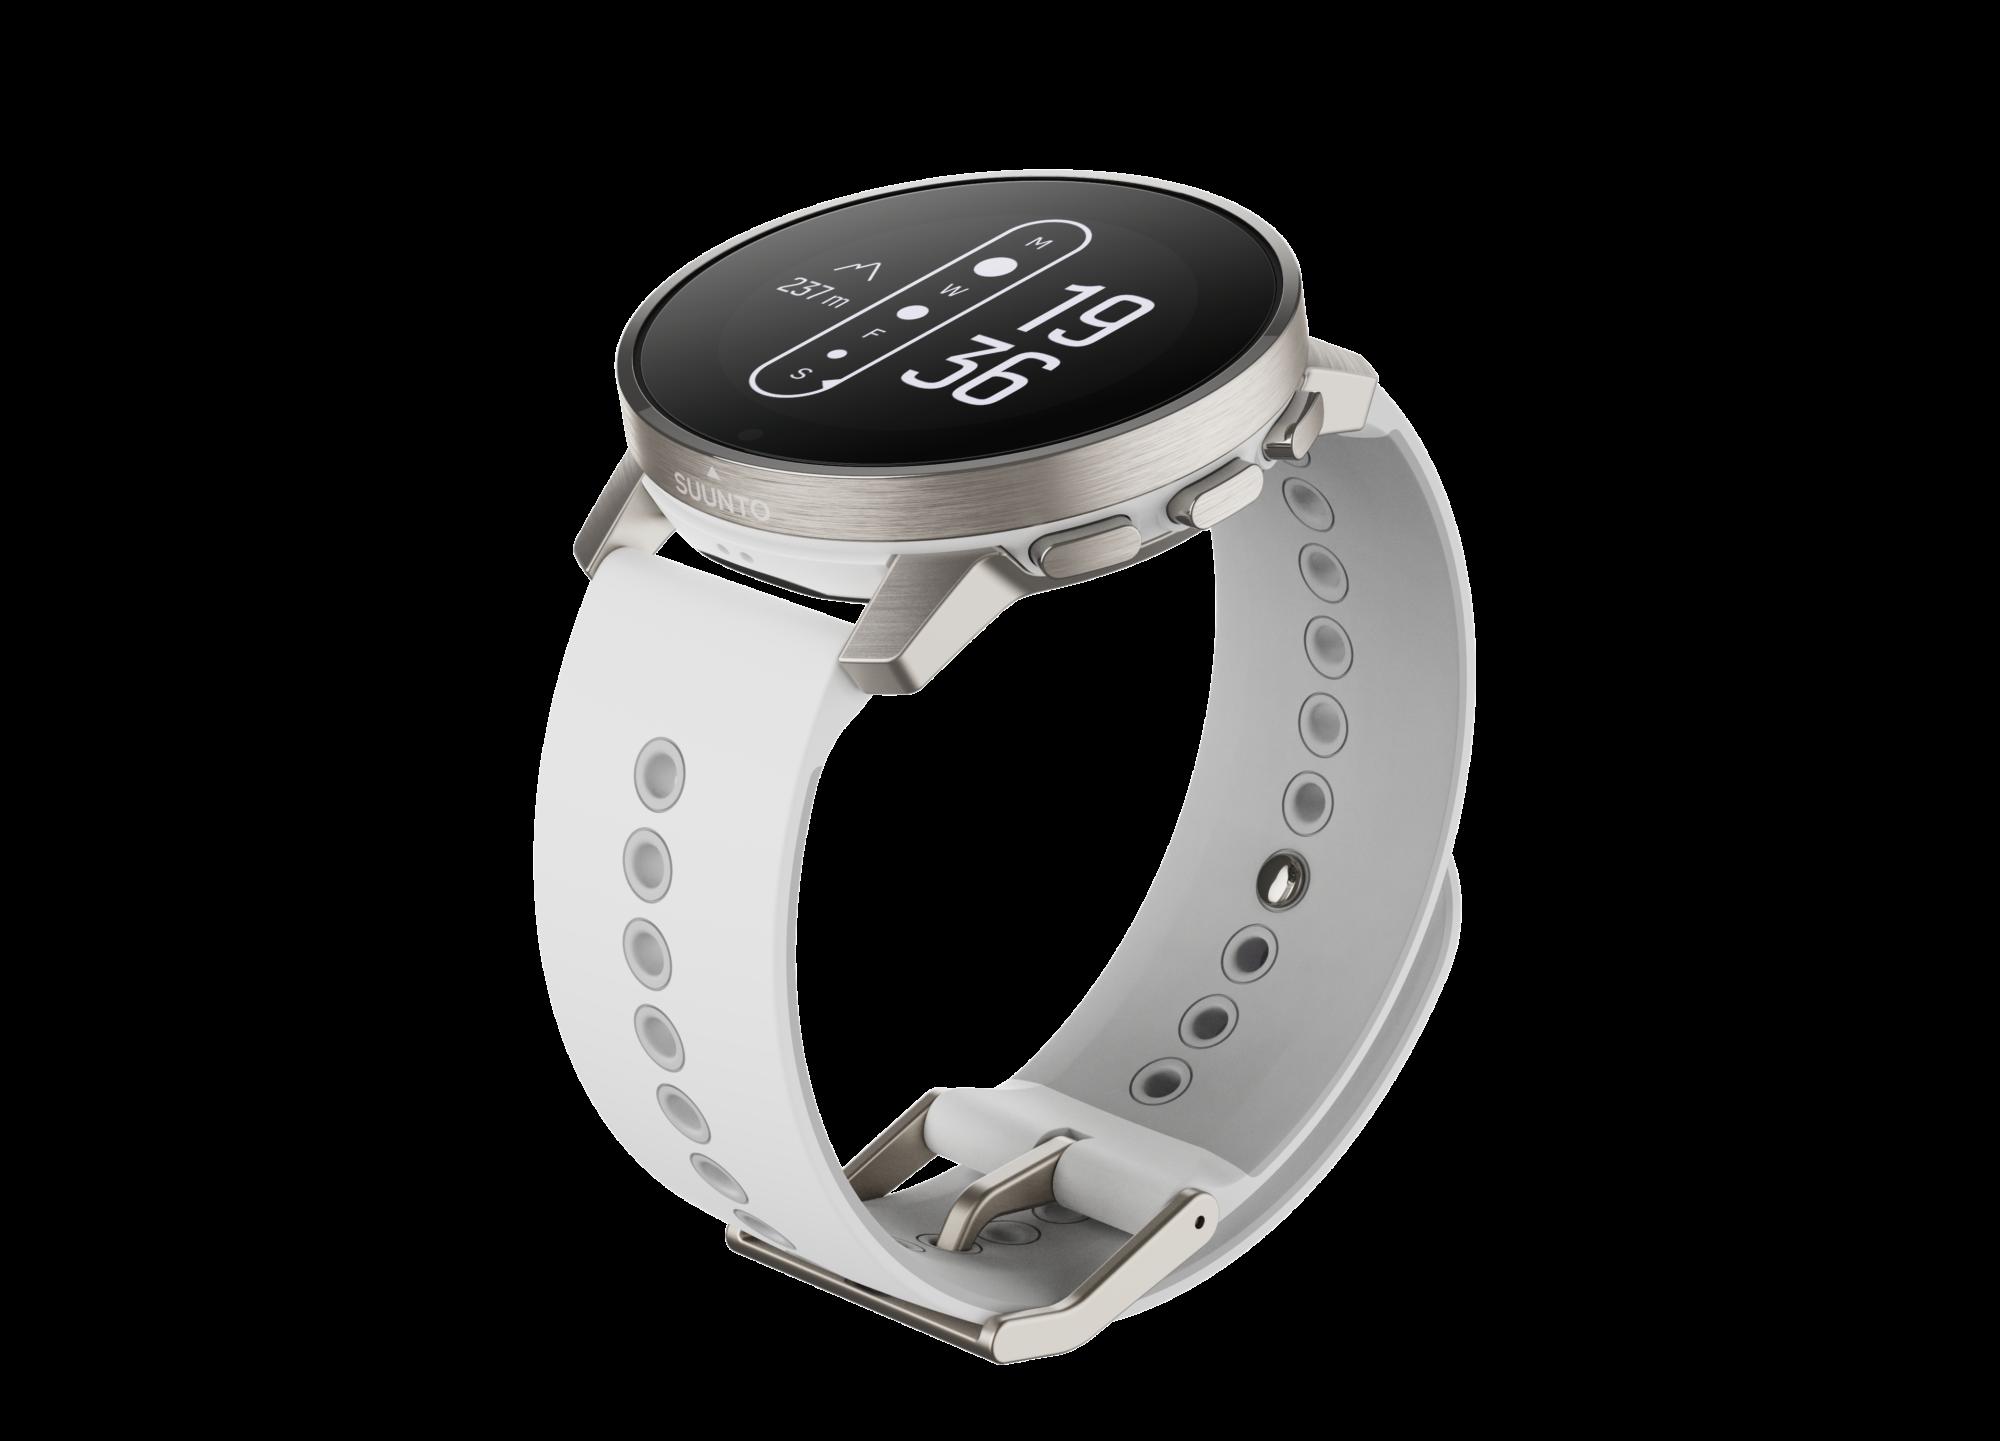 titanium-white-side-quarter-watchface-white-altitude